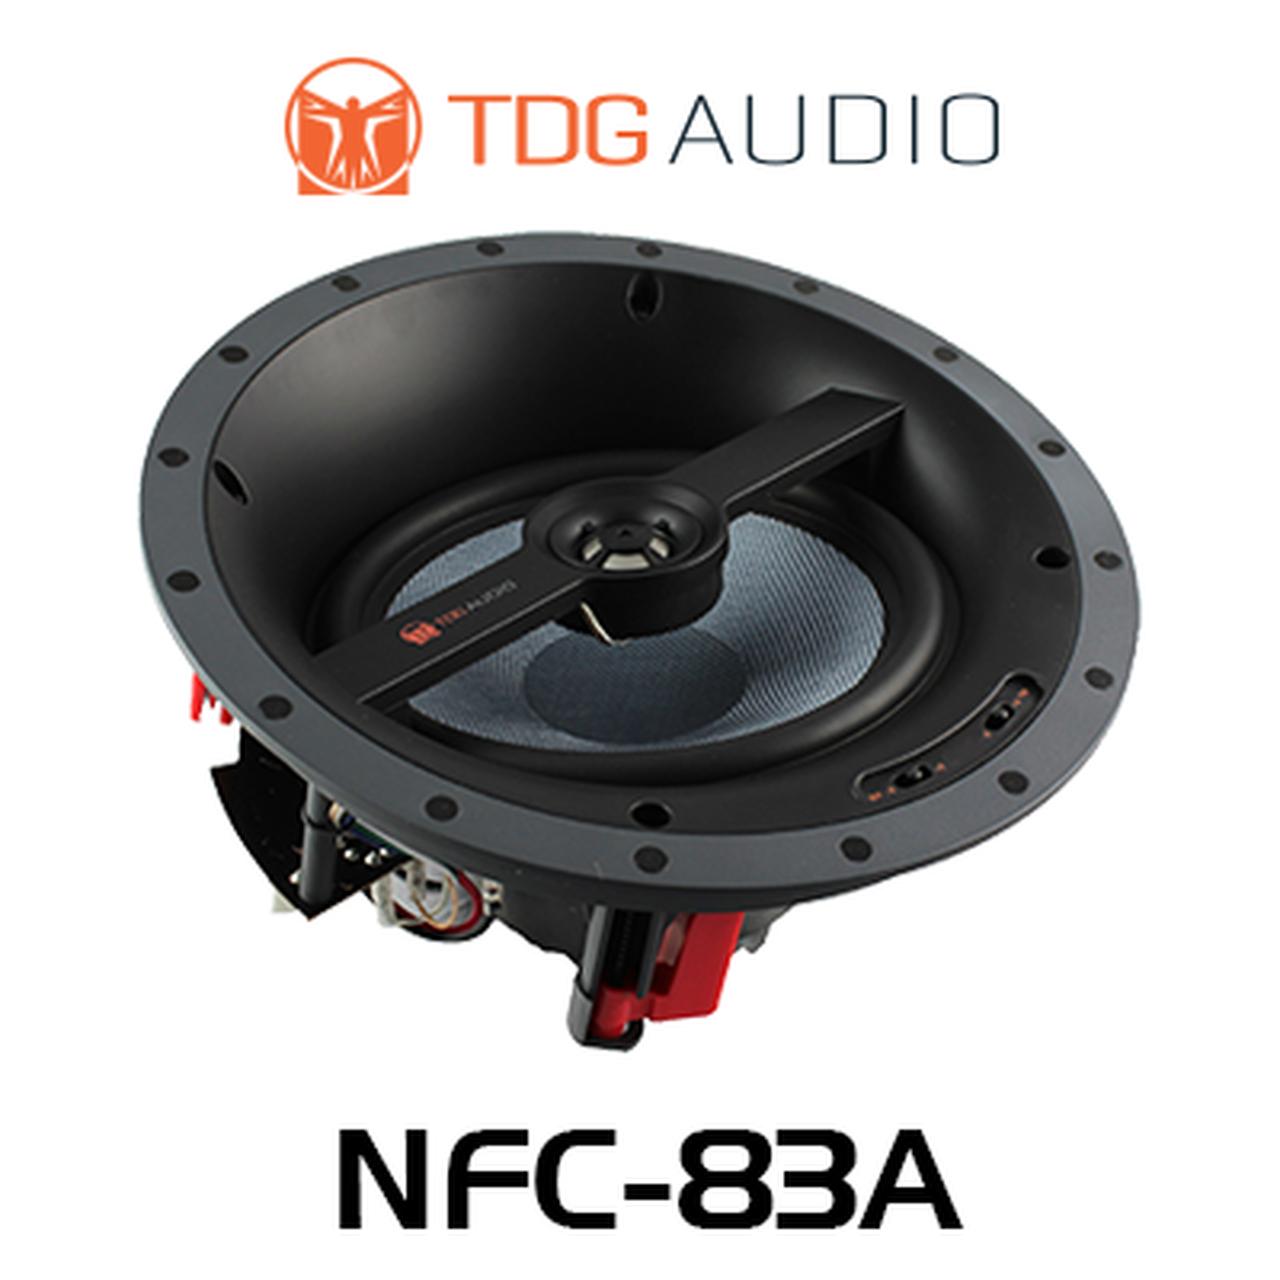 "TDG Audio NFC-83A Angled 8"" In-Ceiling Speaker"